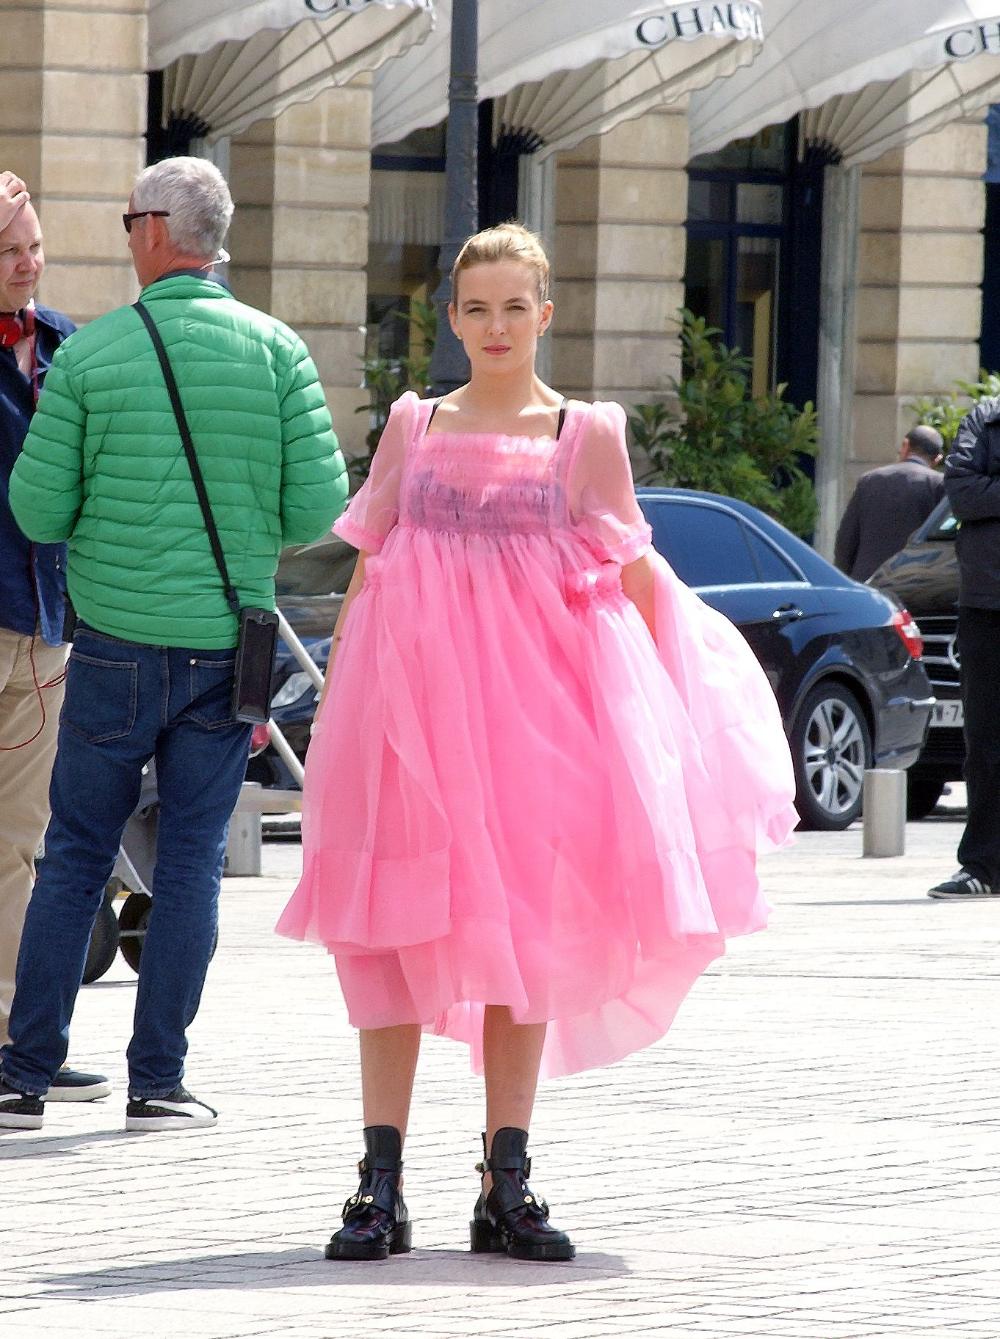 Villanelle Pink Dress Google Search Celebrity Outfits Fashion Eve Dresses [ 1339 x 1000 Pixel ]